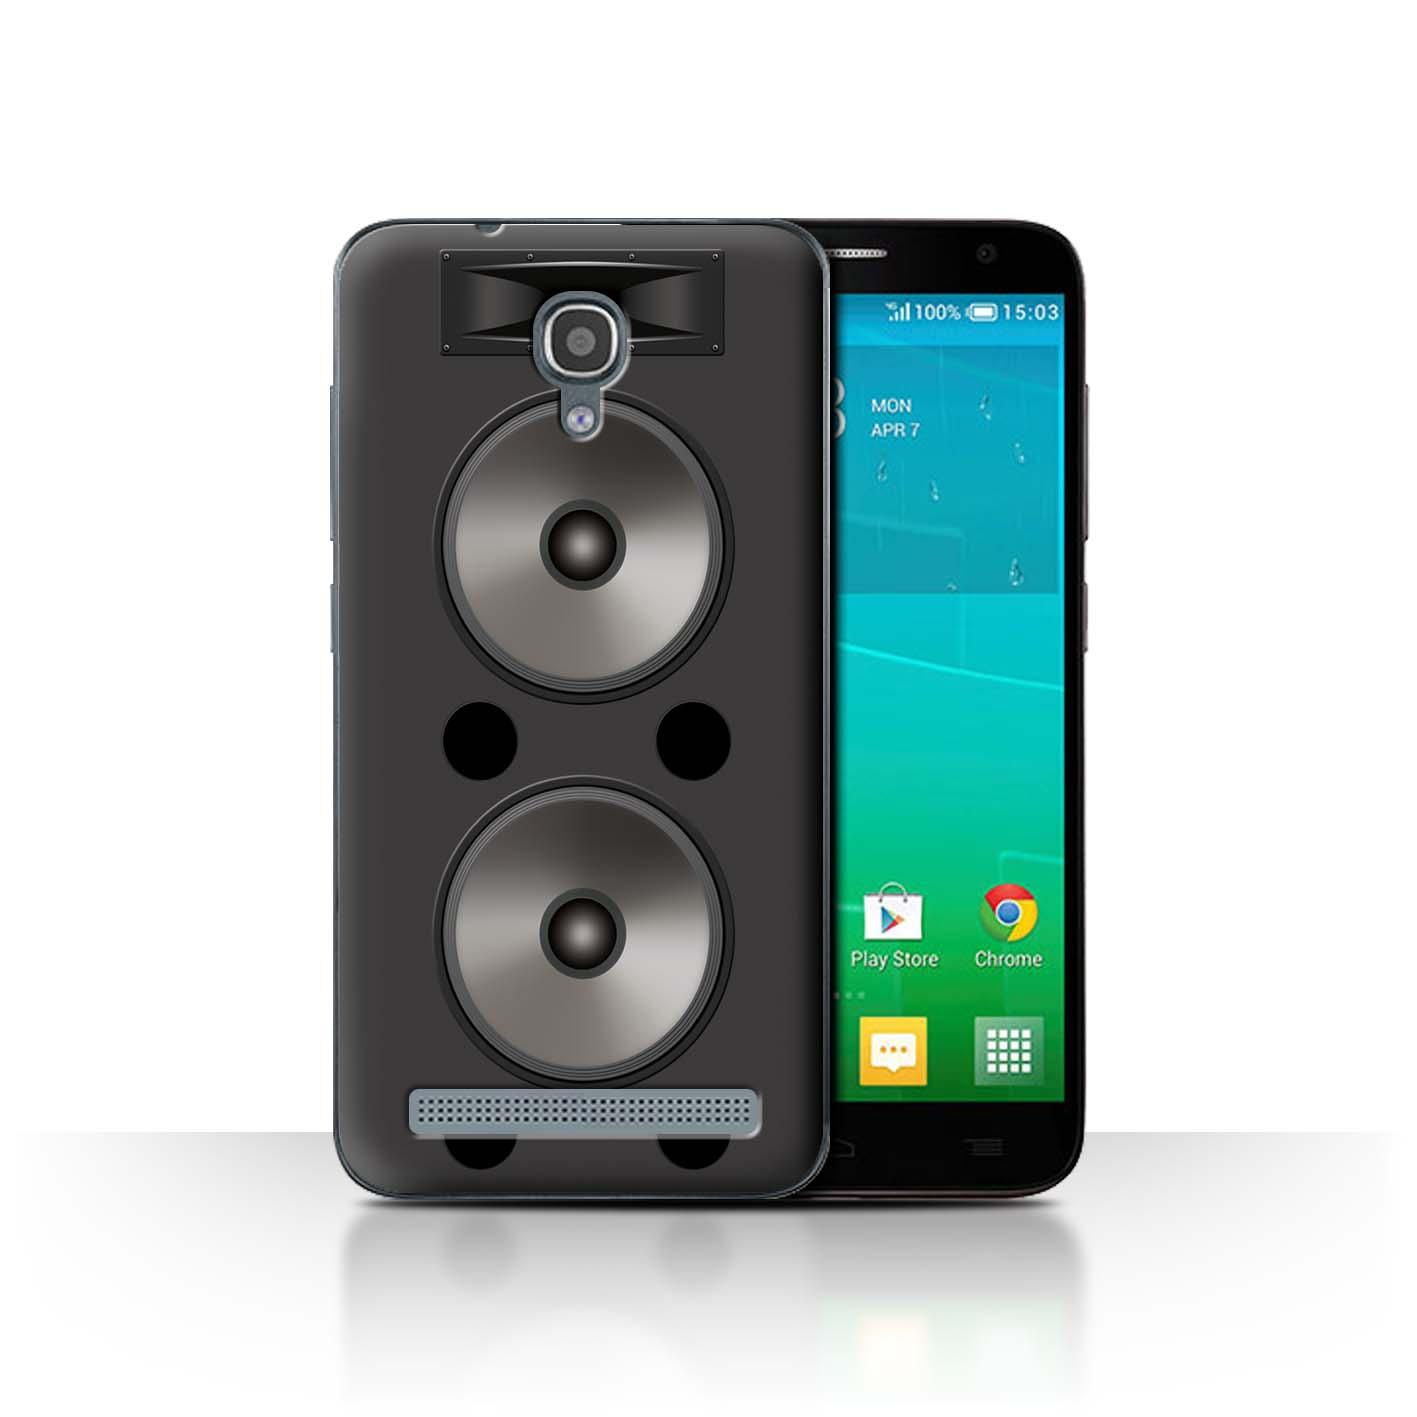 STUFF4-Back-Case-Cover-Skin-for-Alcatel-Idol-2-Mini-S-Speaker-Design